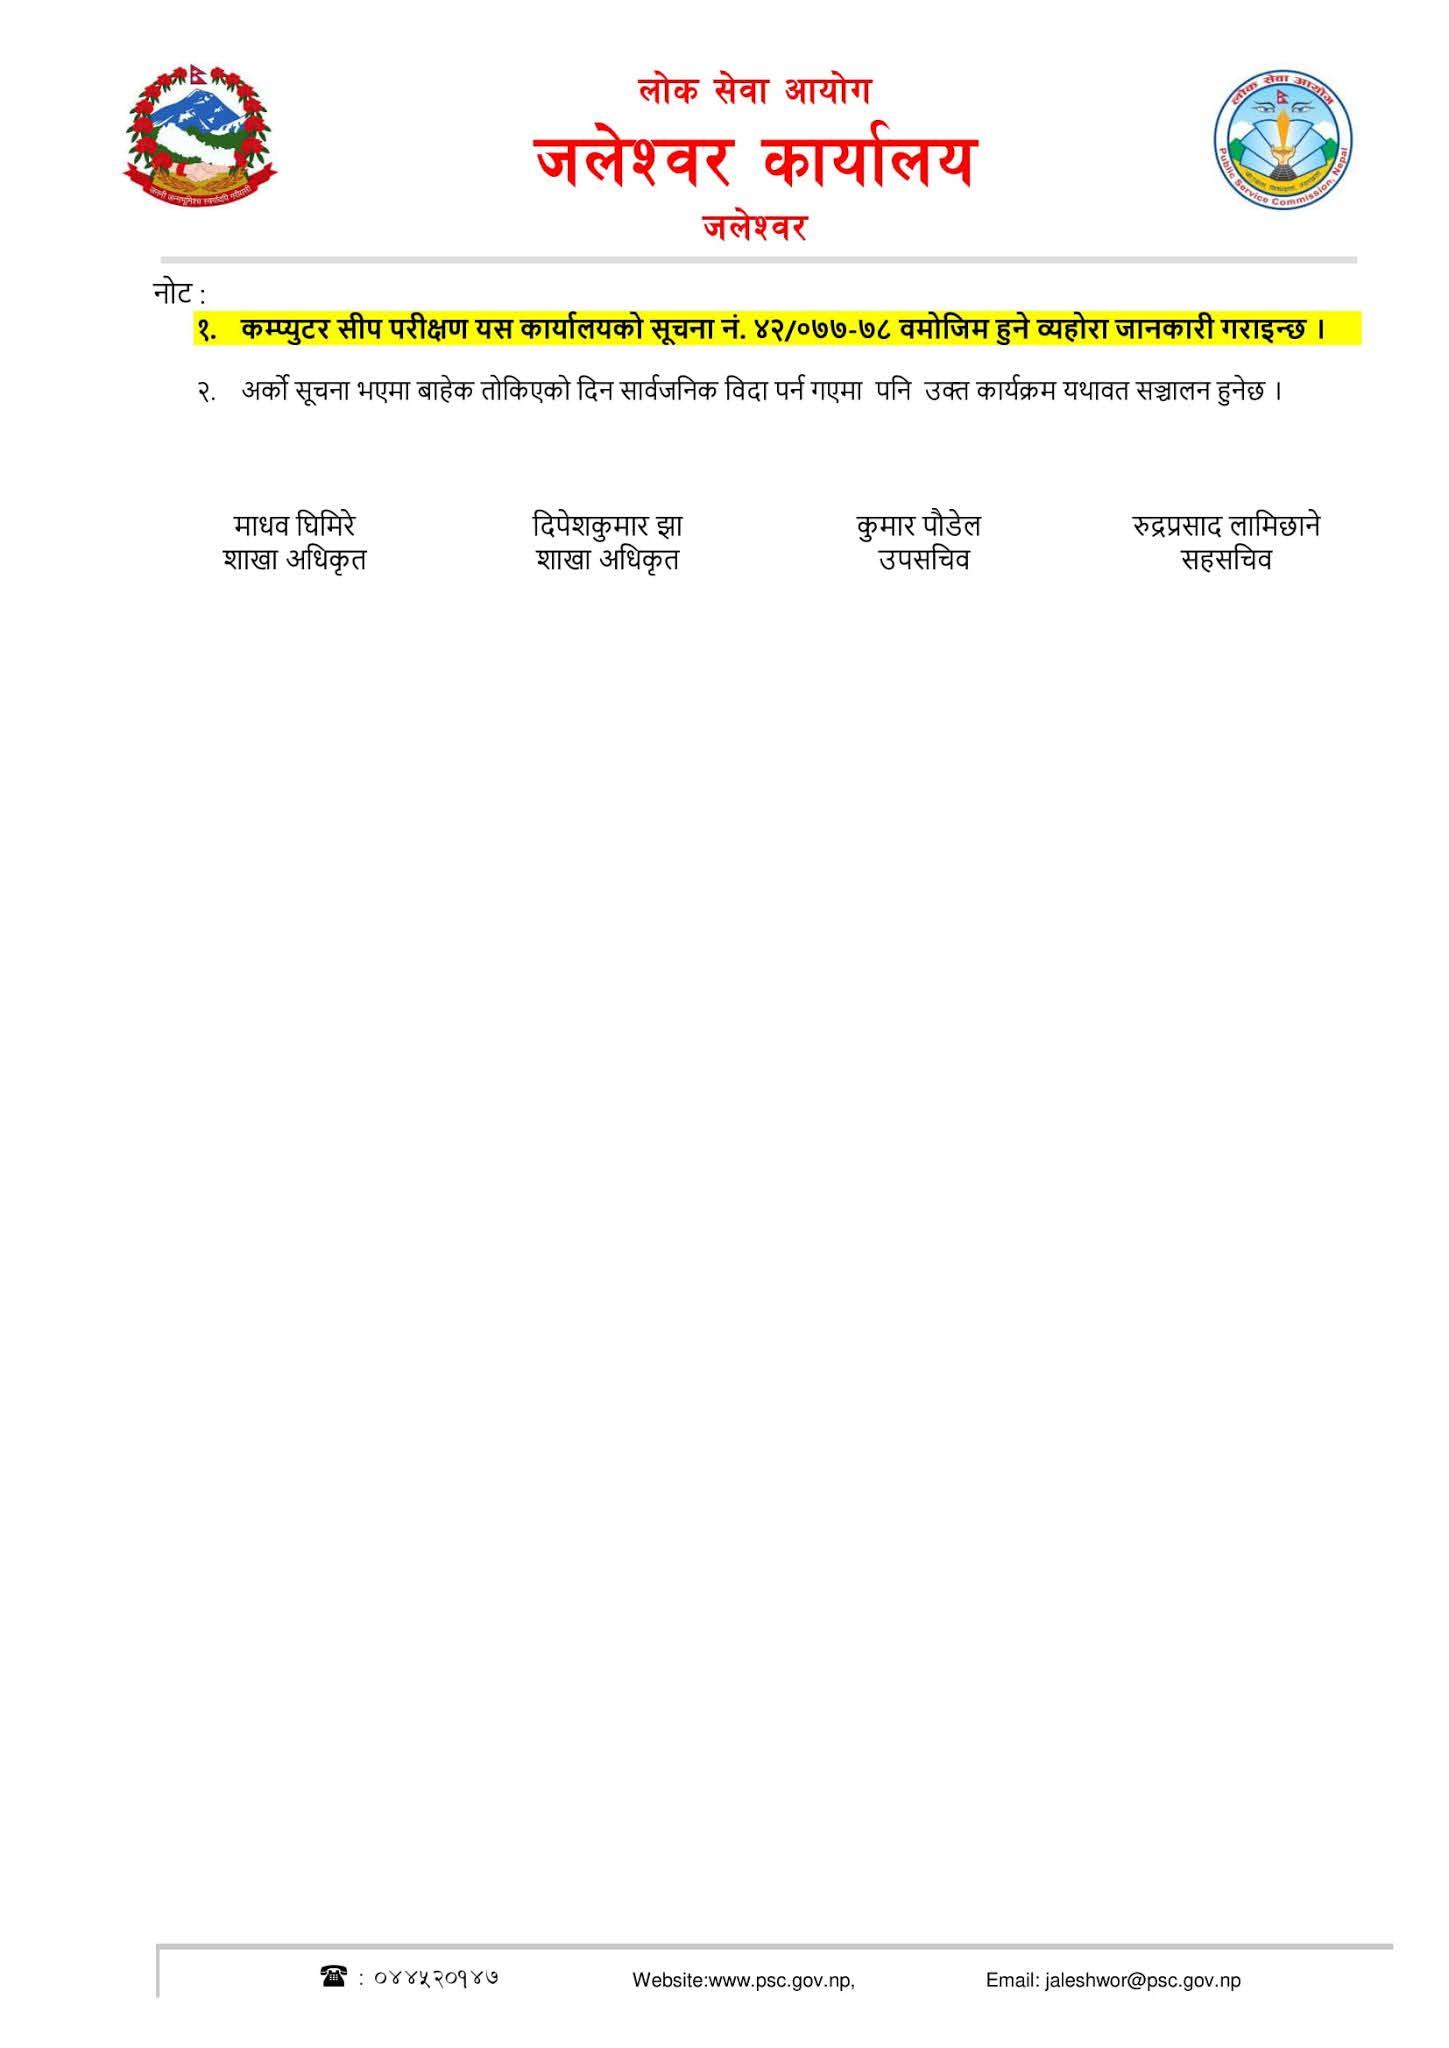 (NASU Justice, Law and Public Prosecutor - Jaleshwor) Lok Sewa Aayog Written Exam Result & Exam Schedule